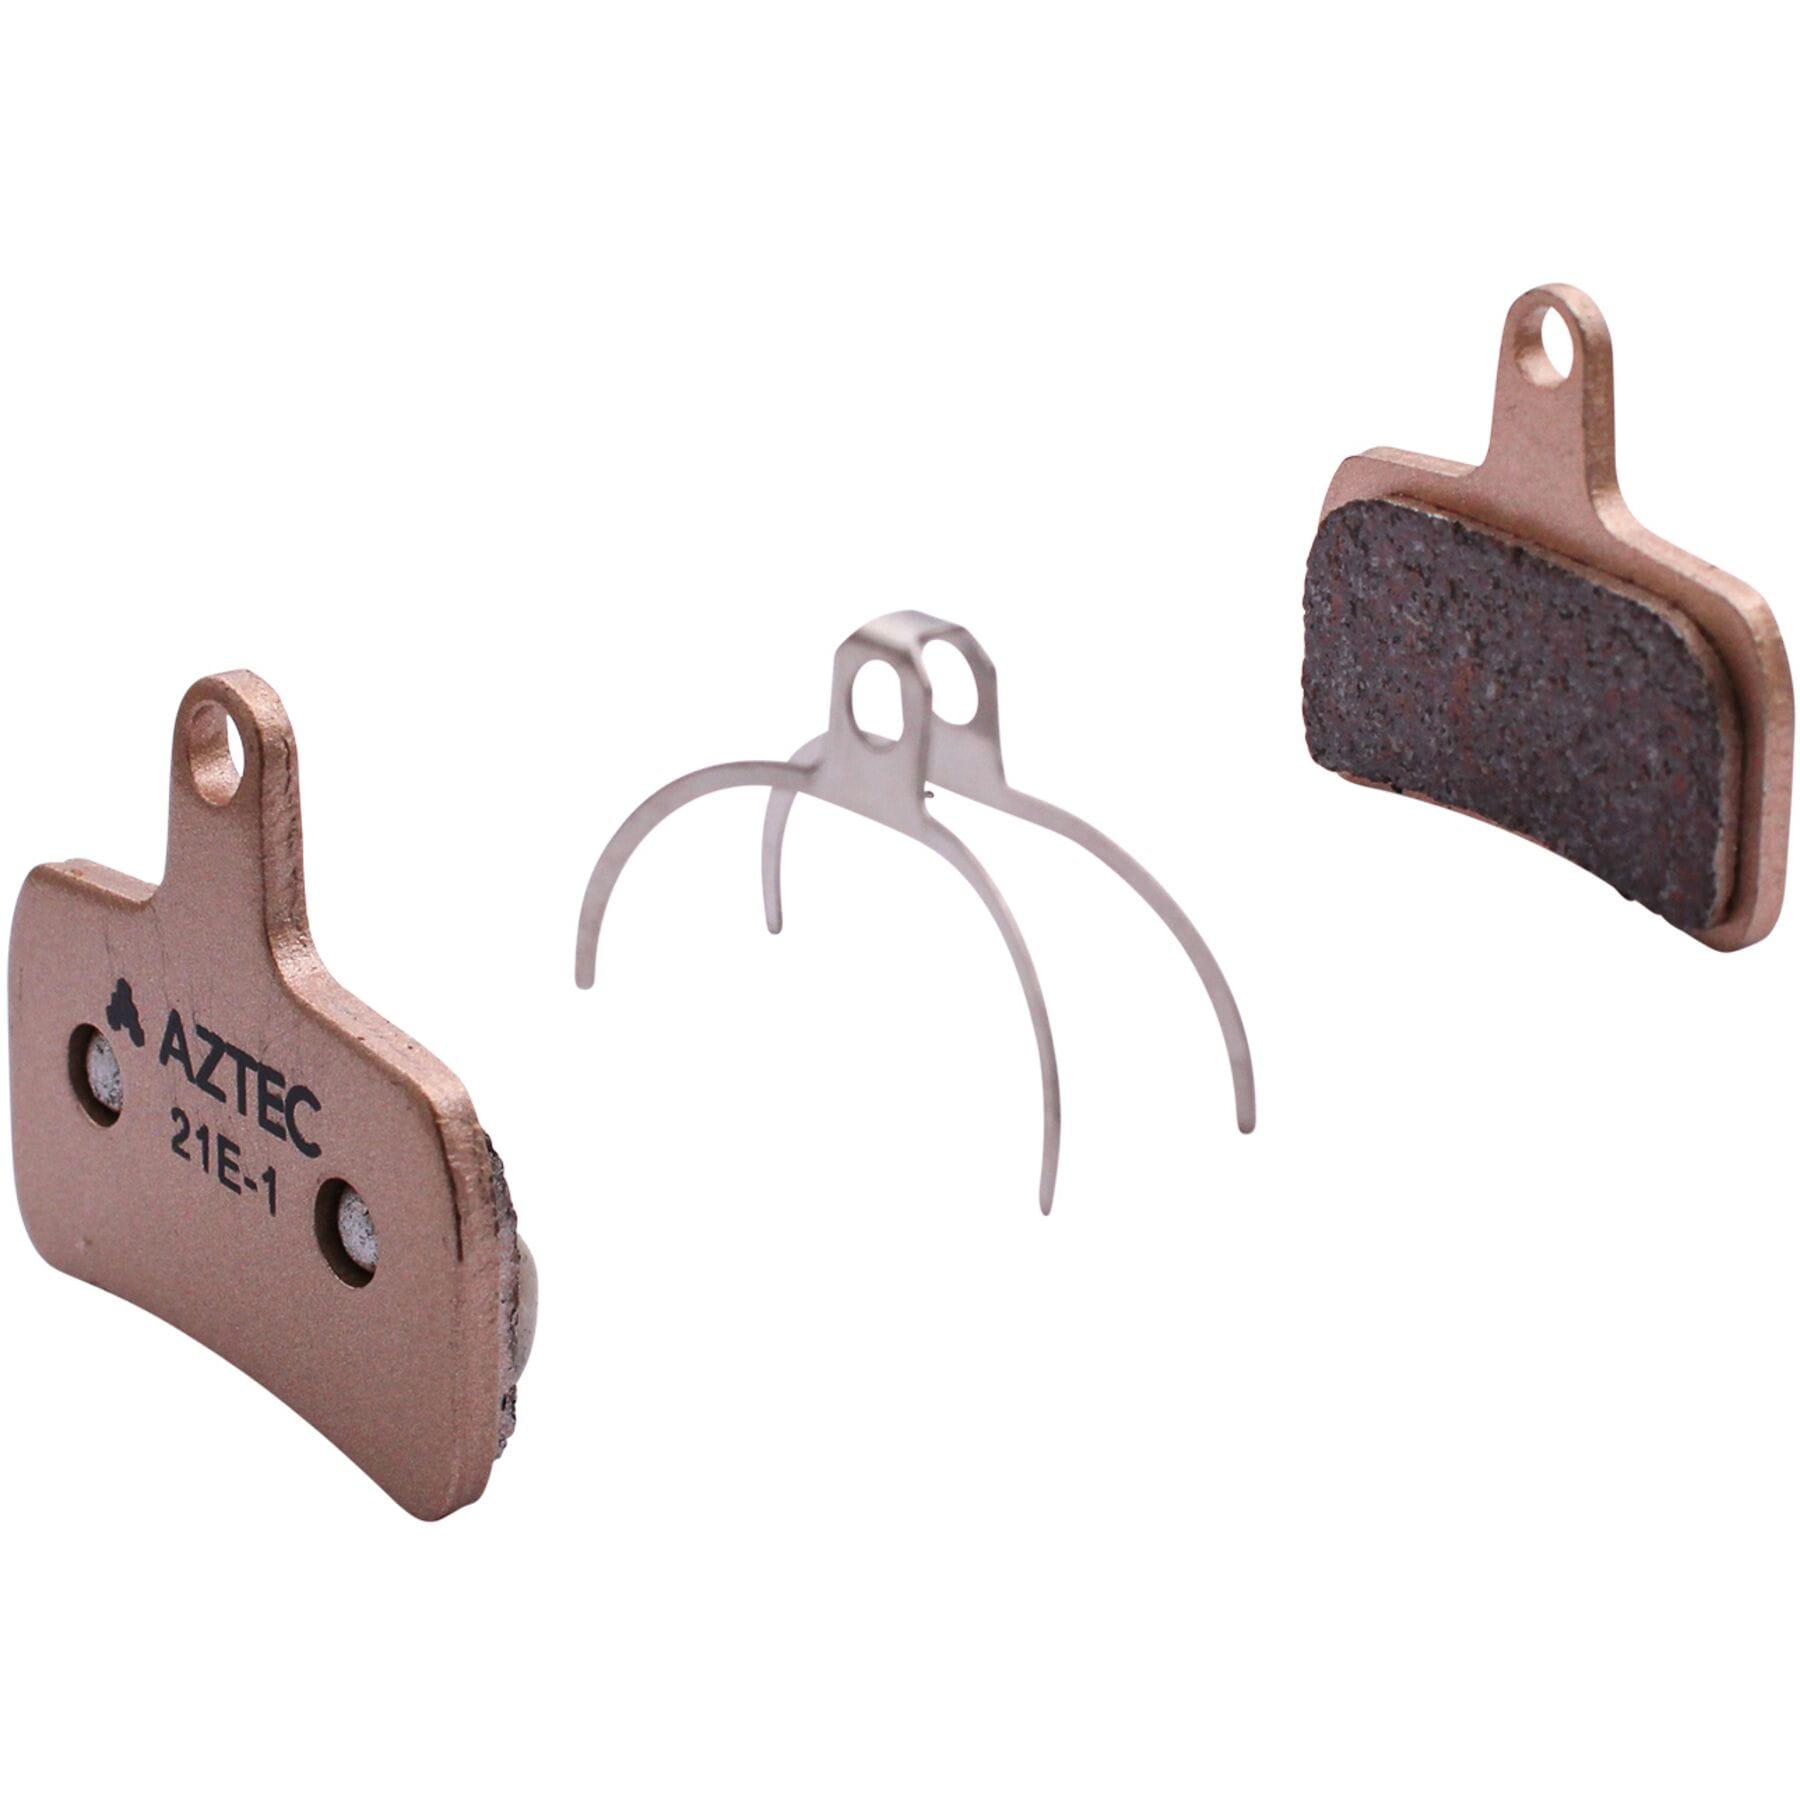 Aztec Sintered disc brake pads for Hope Mono Mini